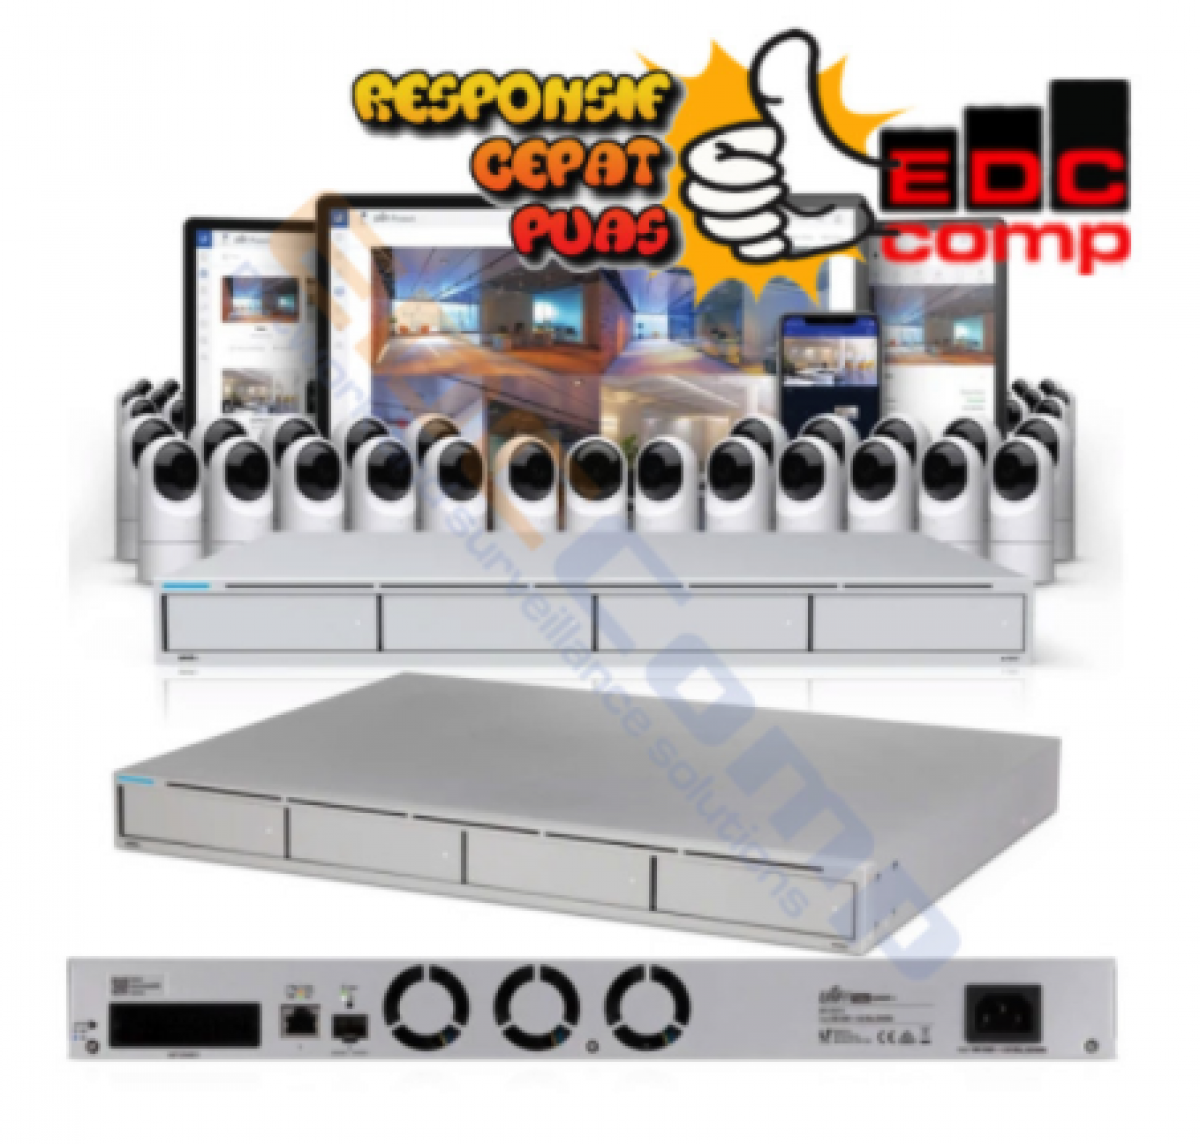 UniFi Protect Network Video Recorder / UNVR - EdcComp